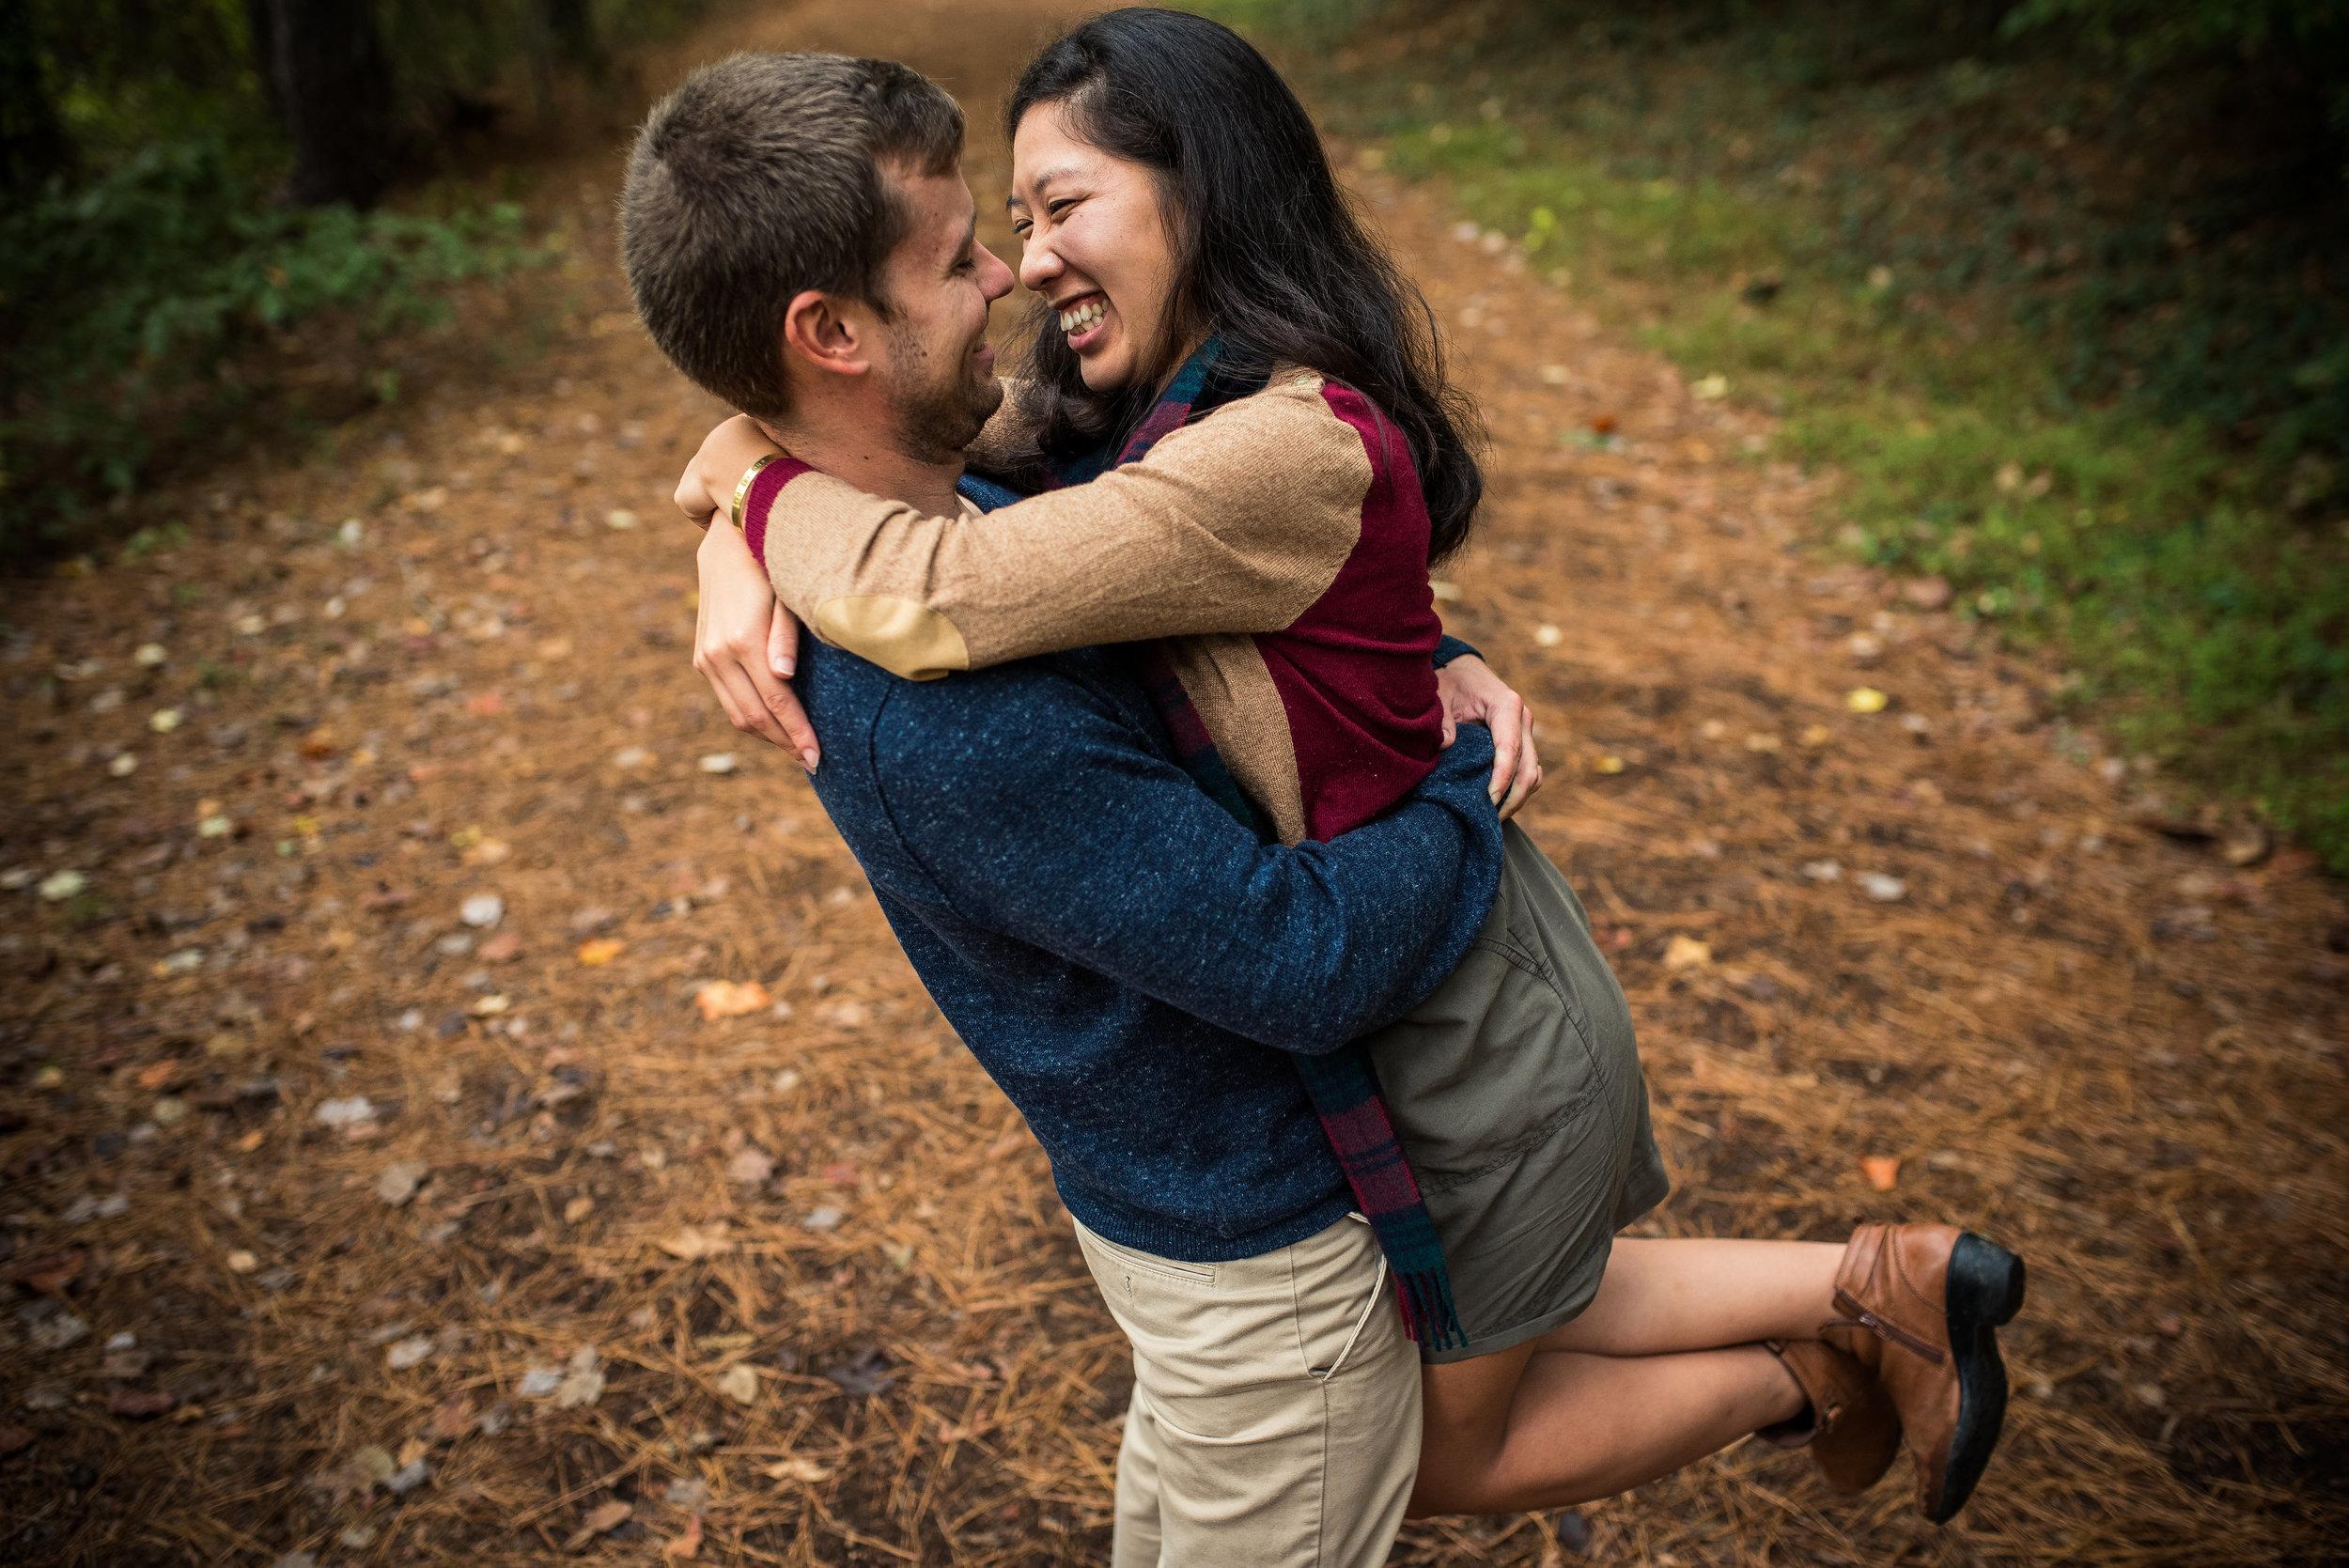 North Carolina Wedding Photographer - Adventure Engagement Session